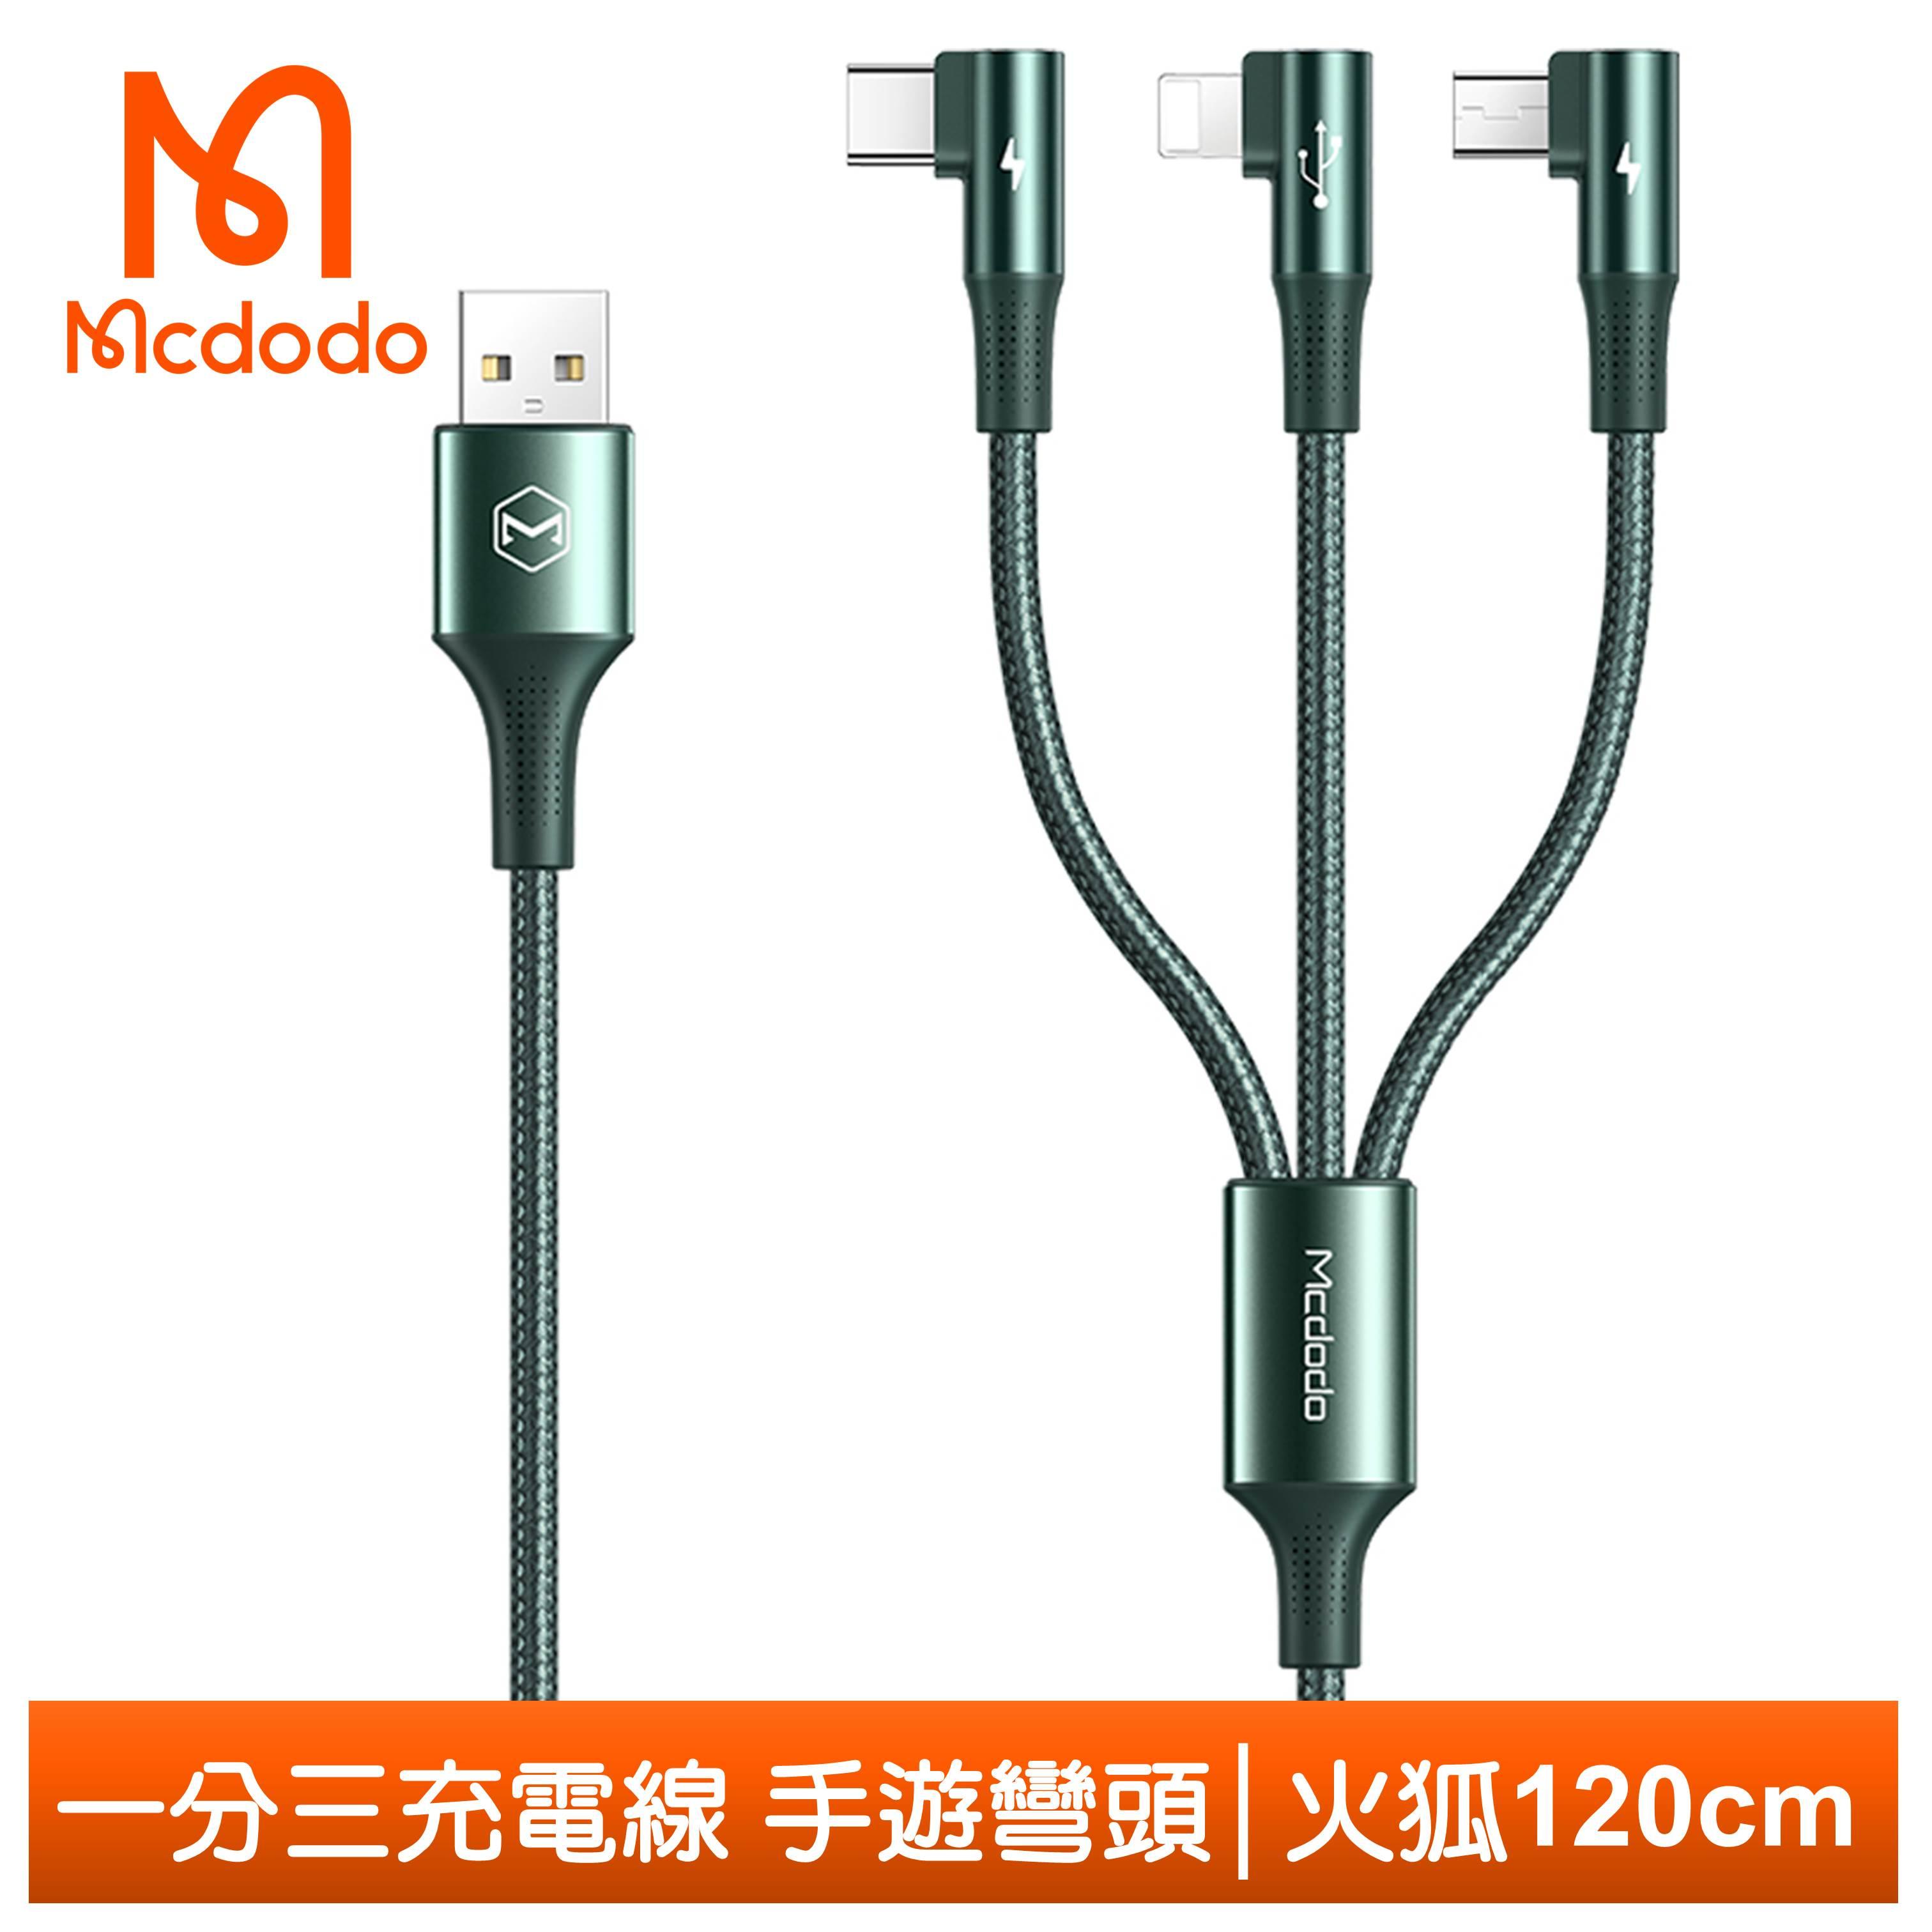 Mcdodo麥多多台灣官方 一分三 Lightning/TypeC/安卓MicroUSB/iPhone充電線傳輸線 手遊彎頭 火狐 1.2M 綠色